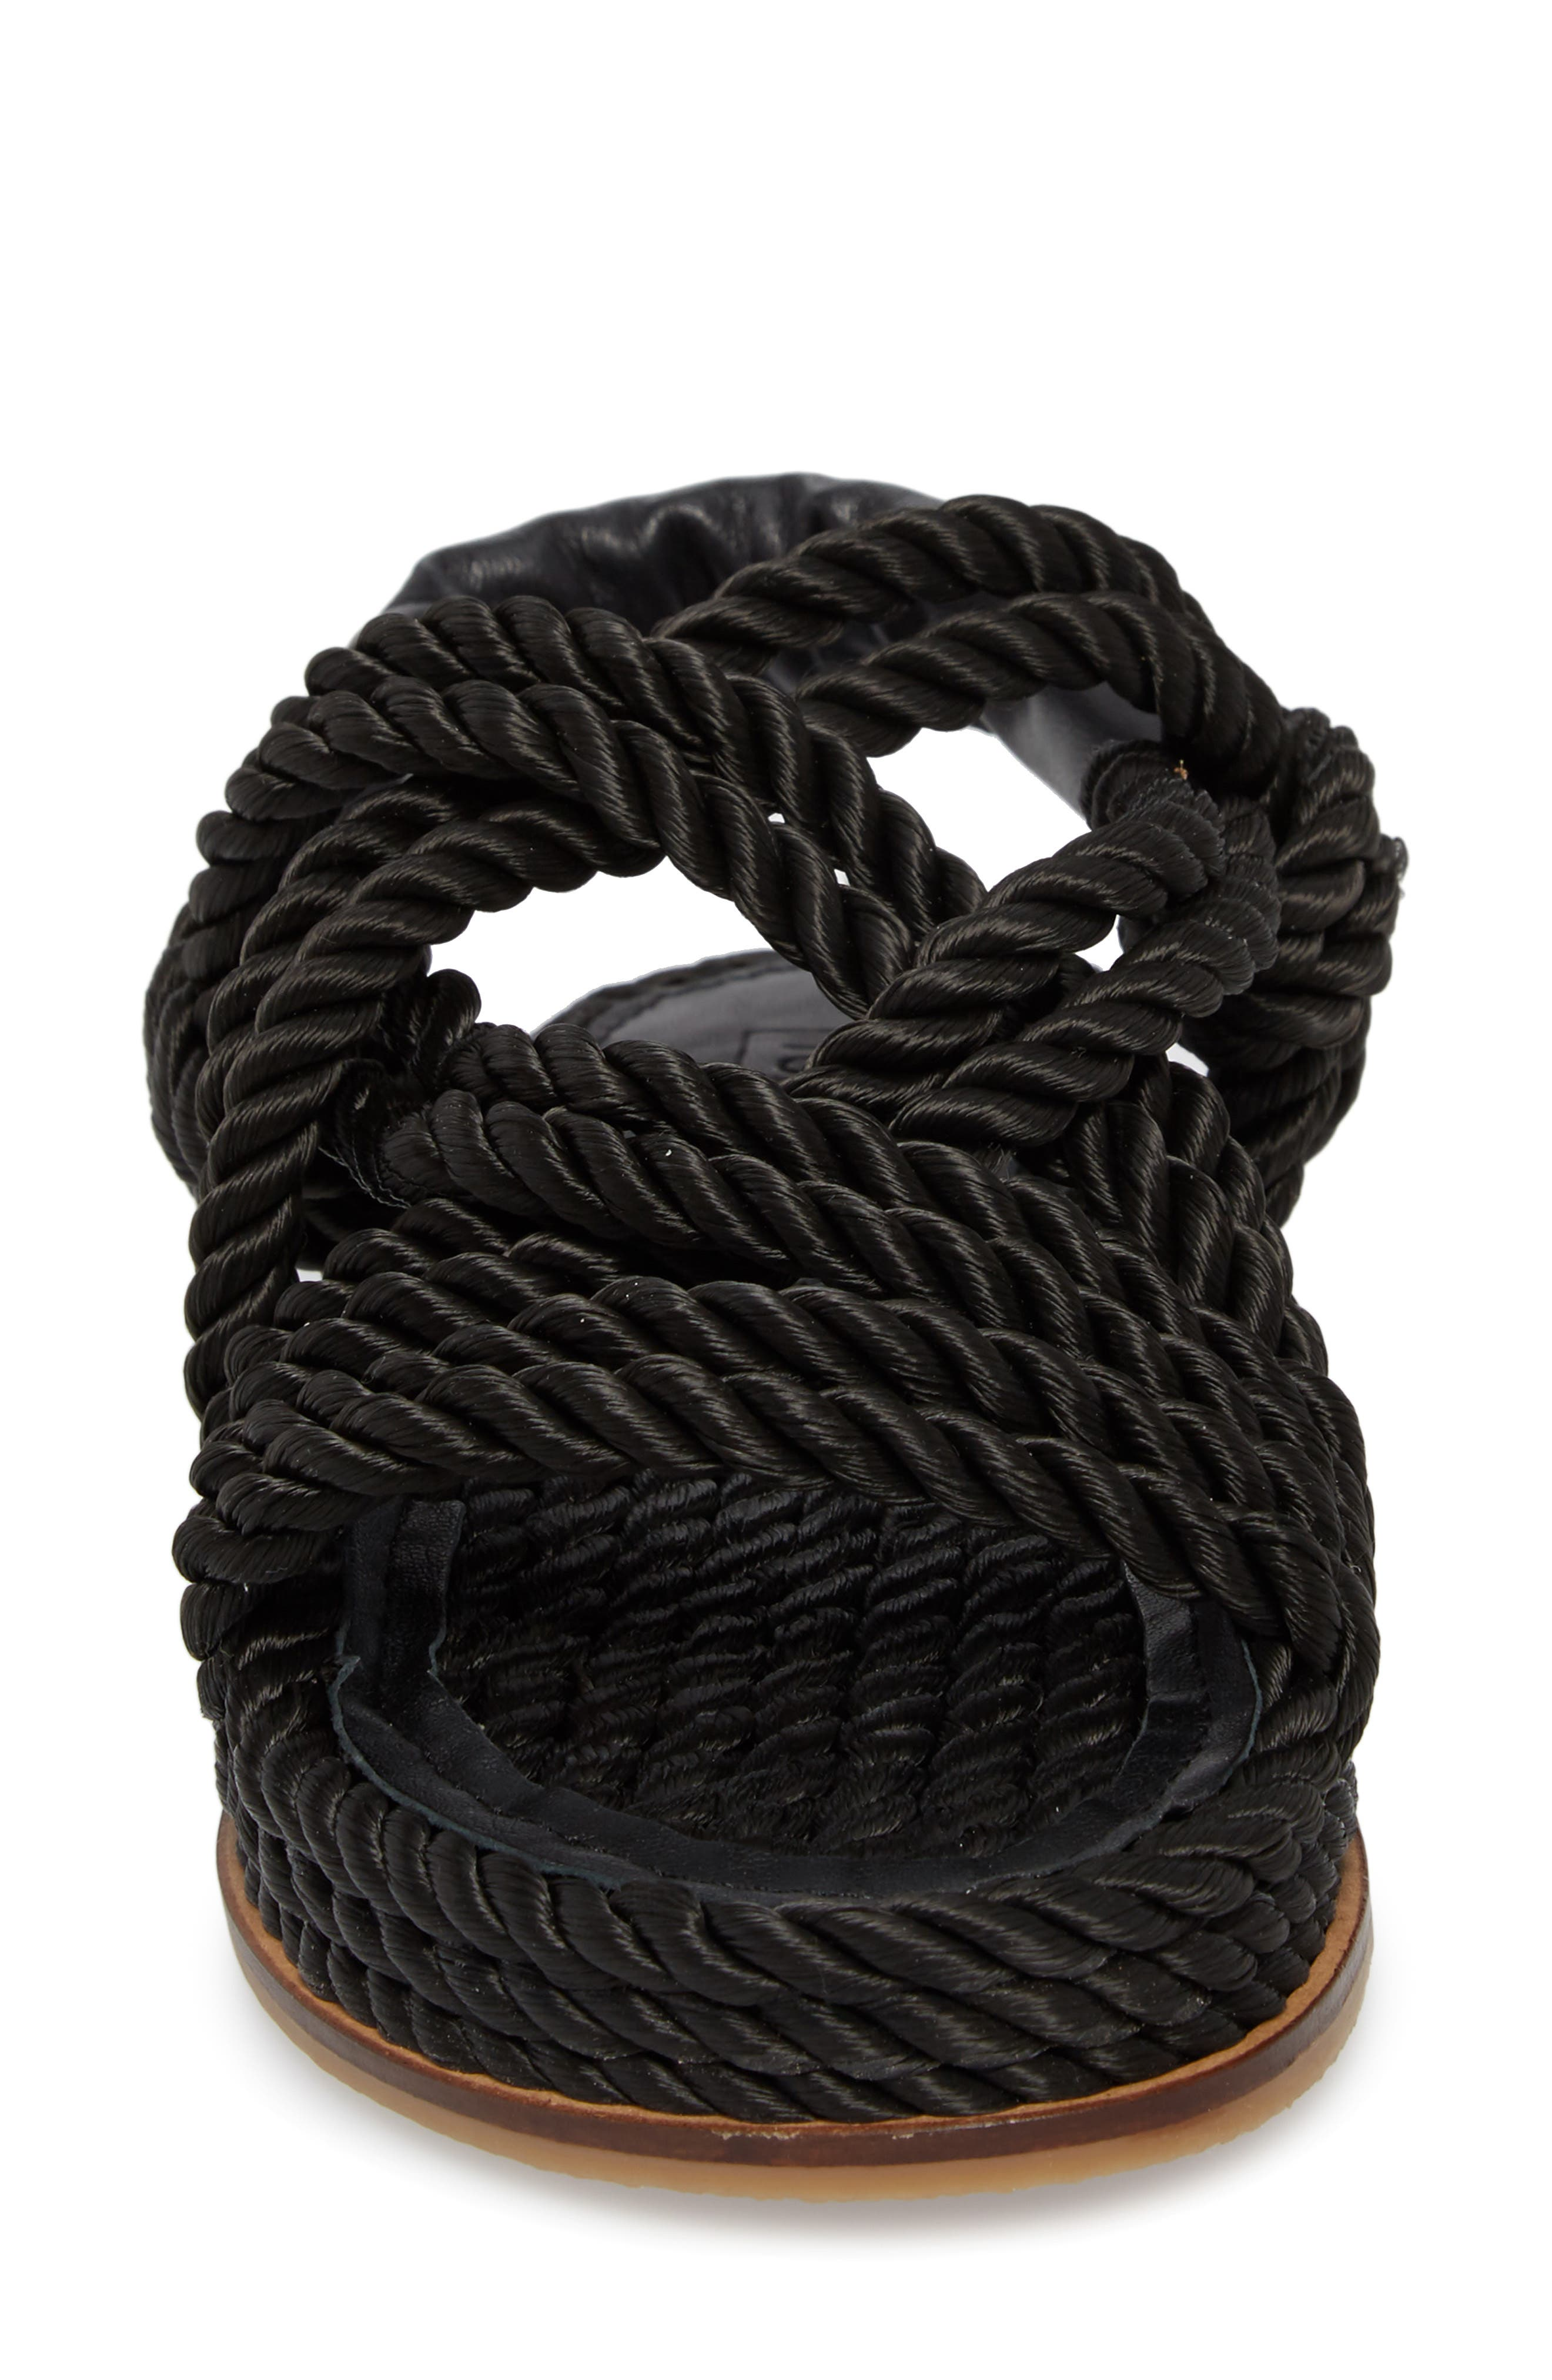 Fiesta Rope Flat Sandal,                             Alternate thumbnail 4, color,                             001